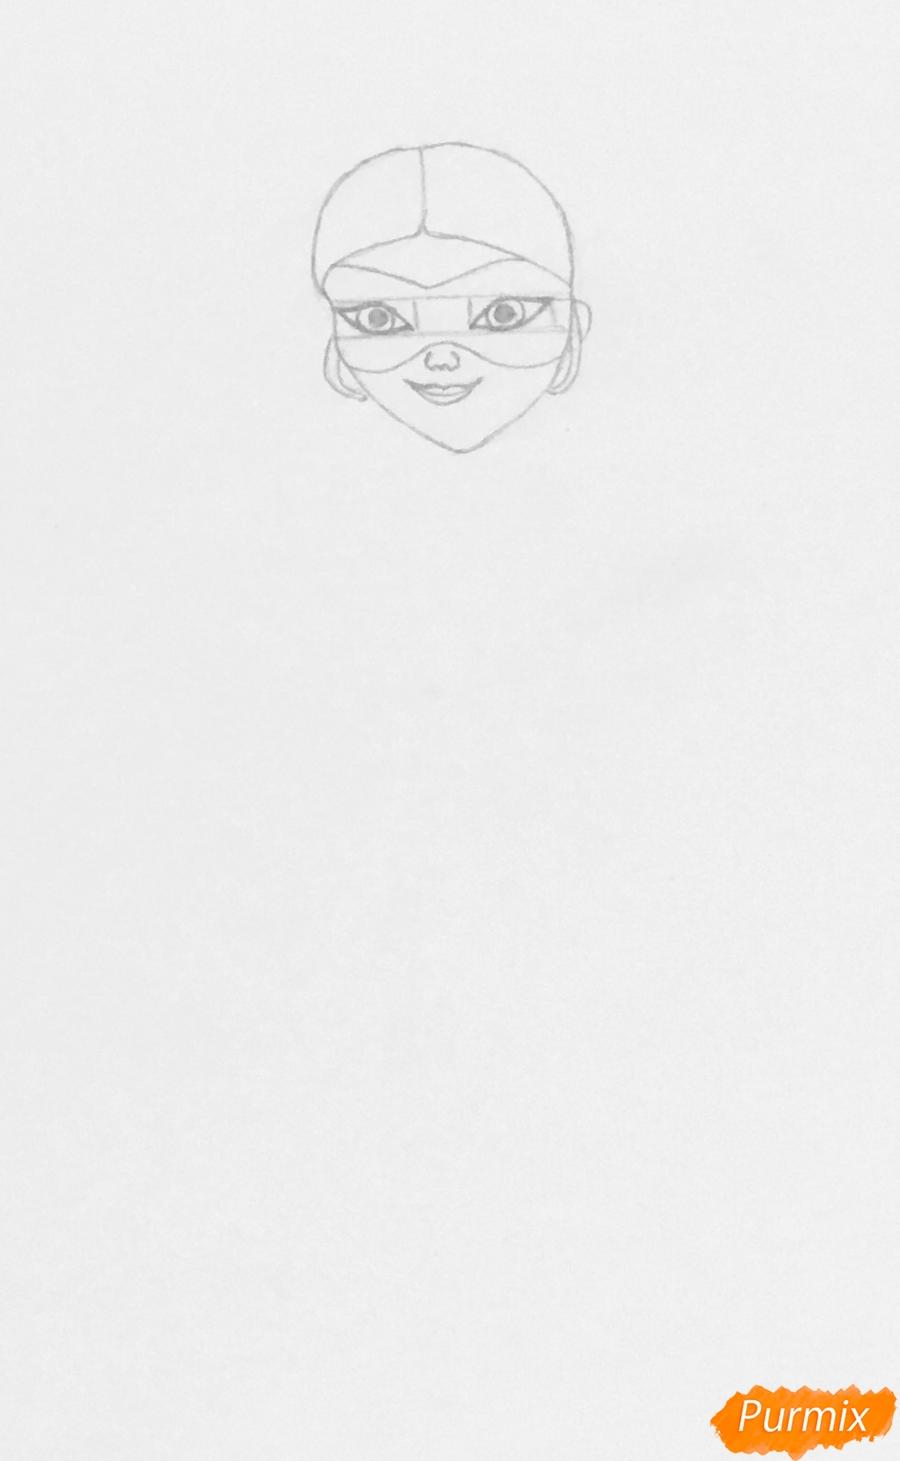 Рисуем Хлою пчелу из мультфильма Леди Баг и Супер Кот - фото 2